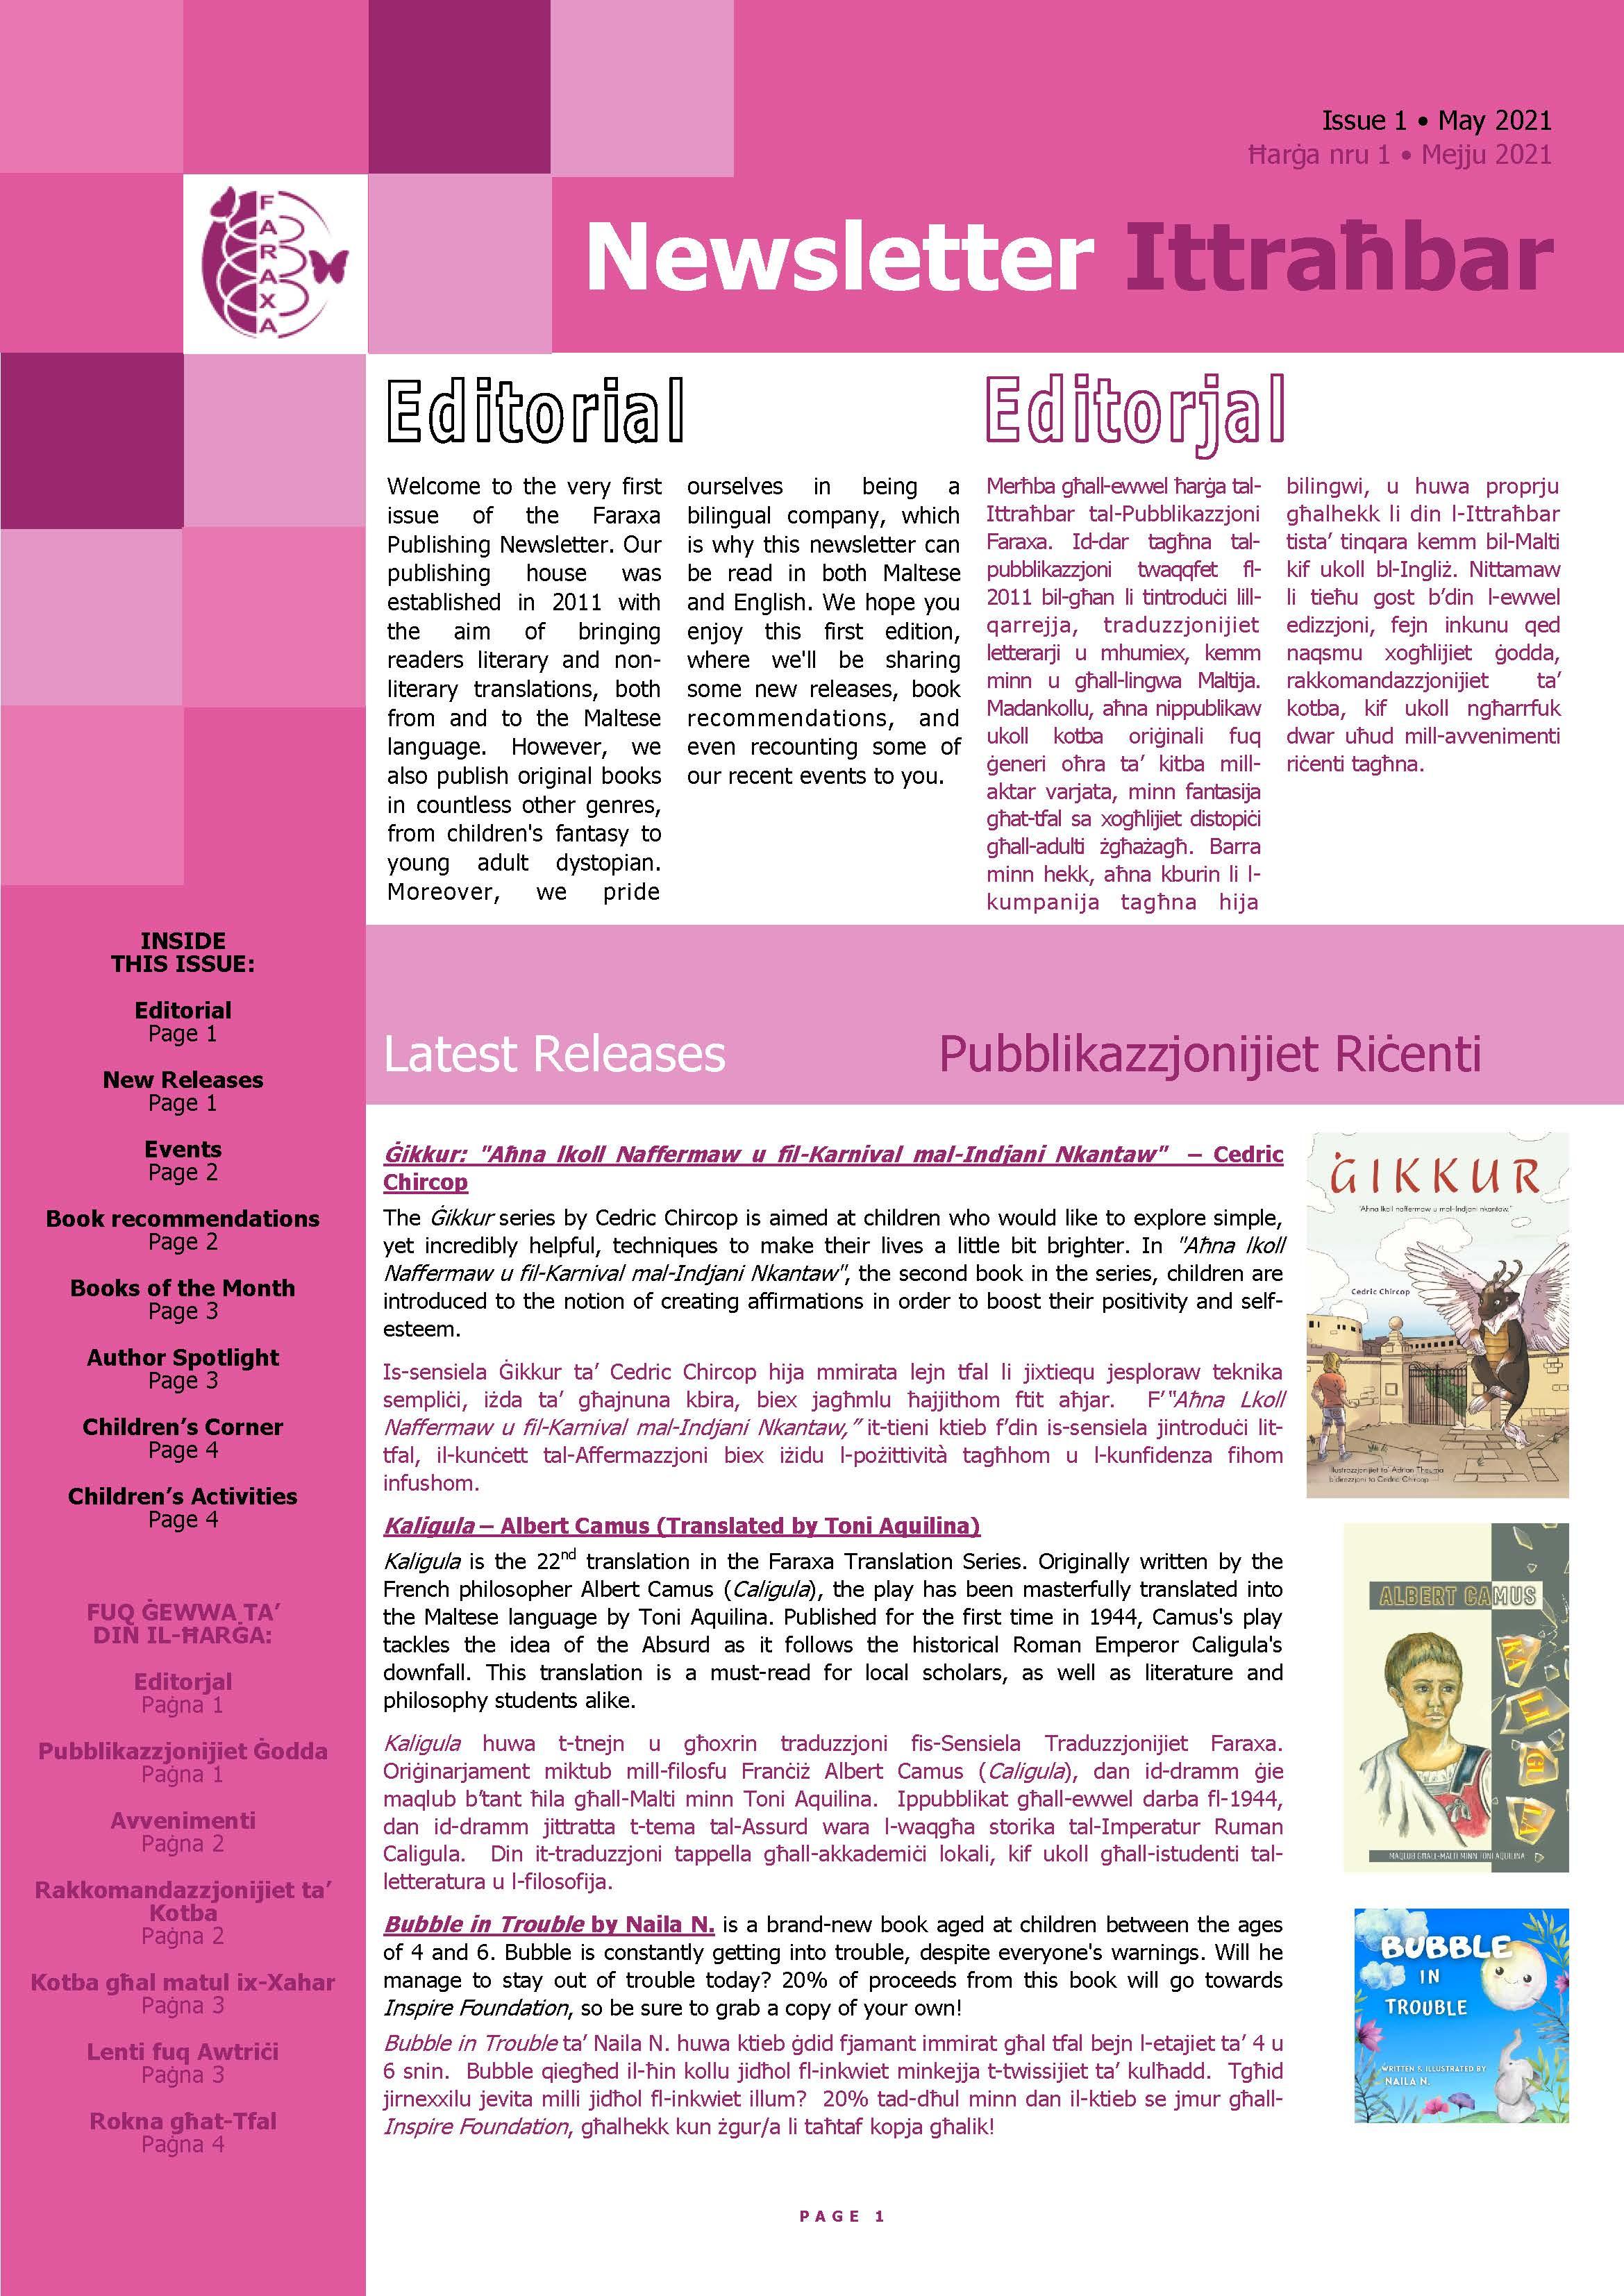 Faraxa Newsletter Issue 1